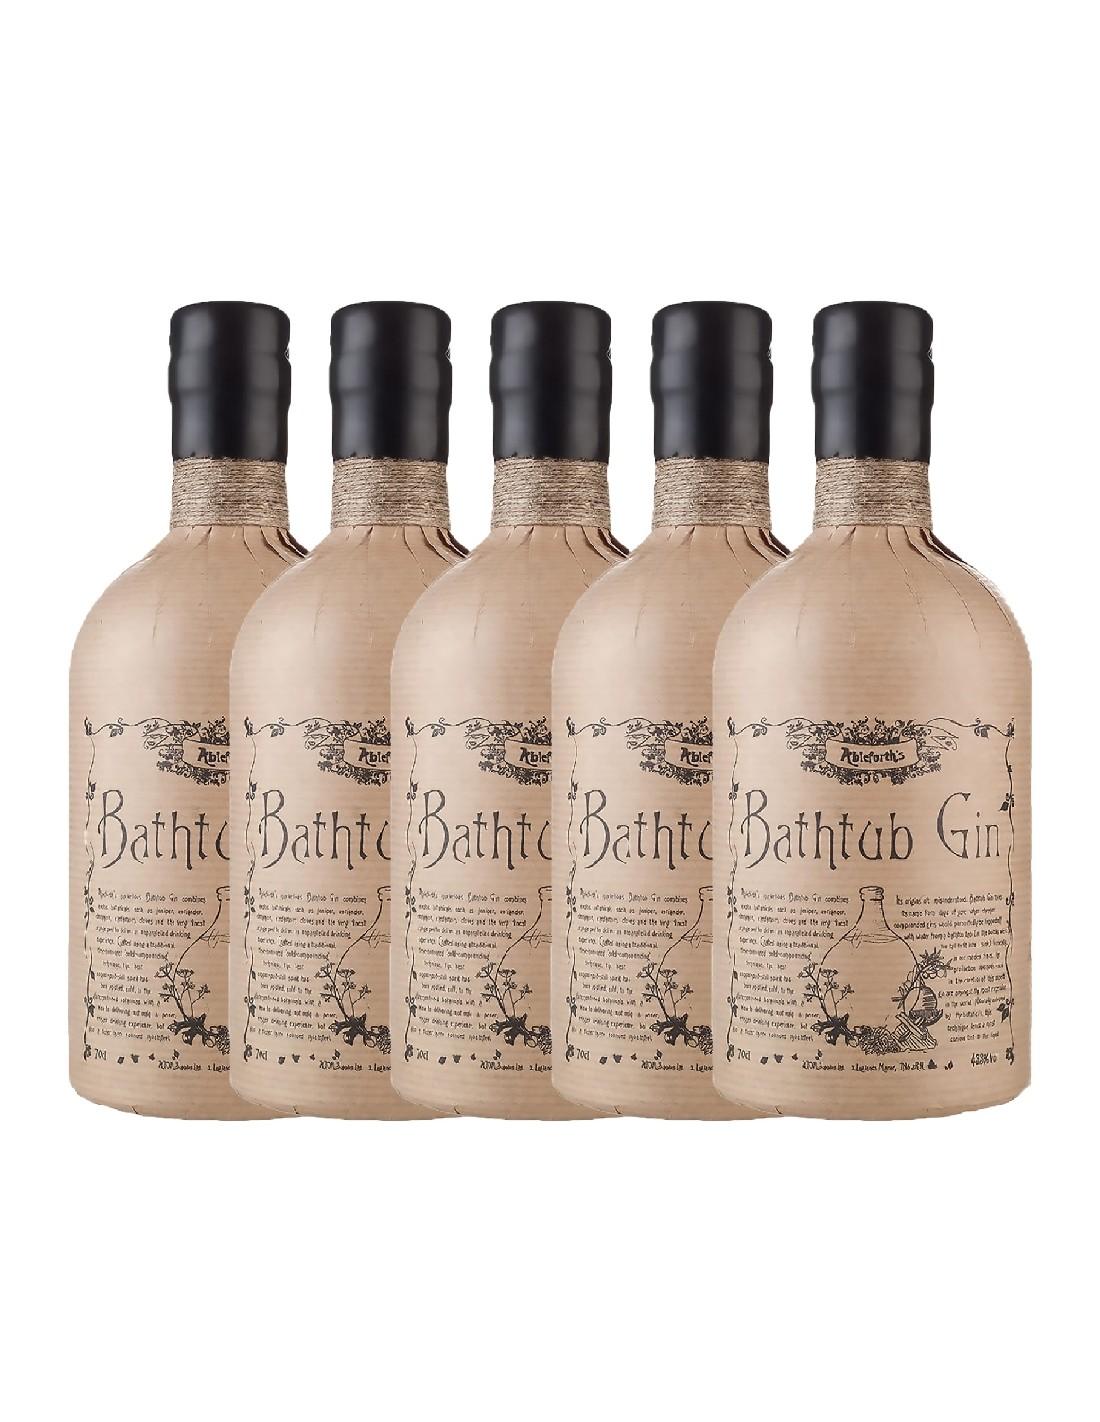 Pachet 5 sticle Gin Bathtub 43.3% alc., 0.7L